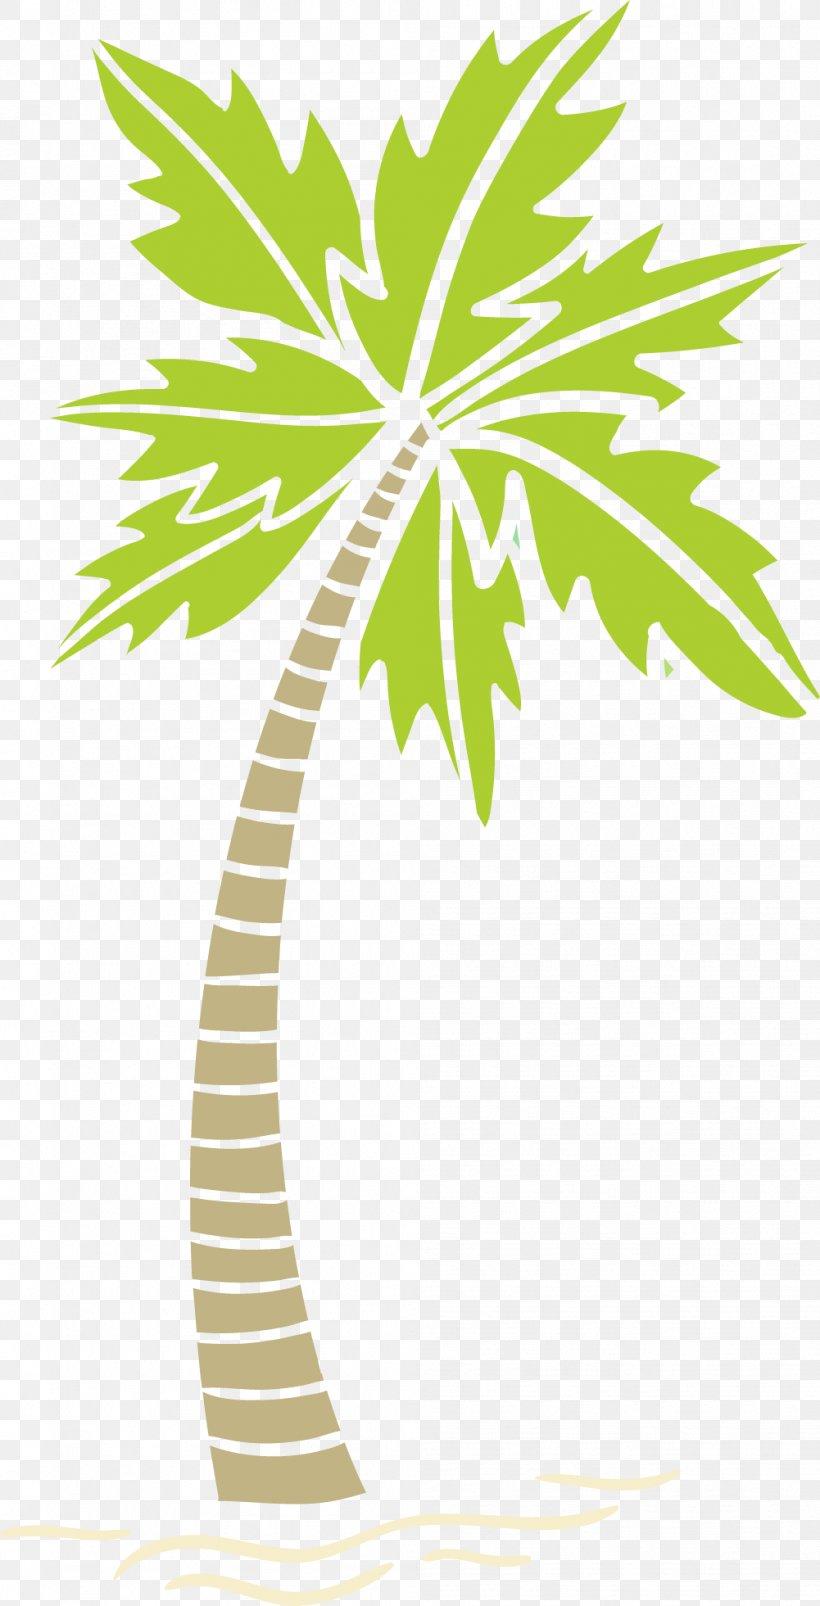 Arecaceae Areca Palm Tree, PNG, 1001x1961px, Arecaceae, Areca Palm, Arecales, Branch, Diagram Download Free